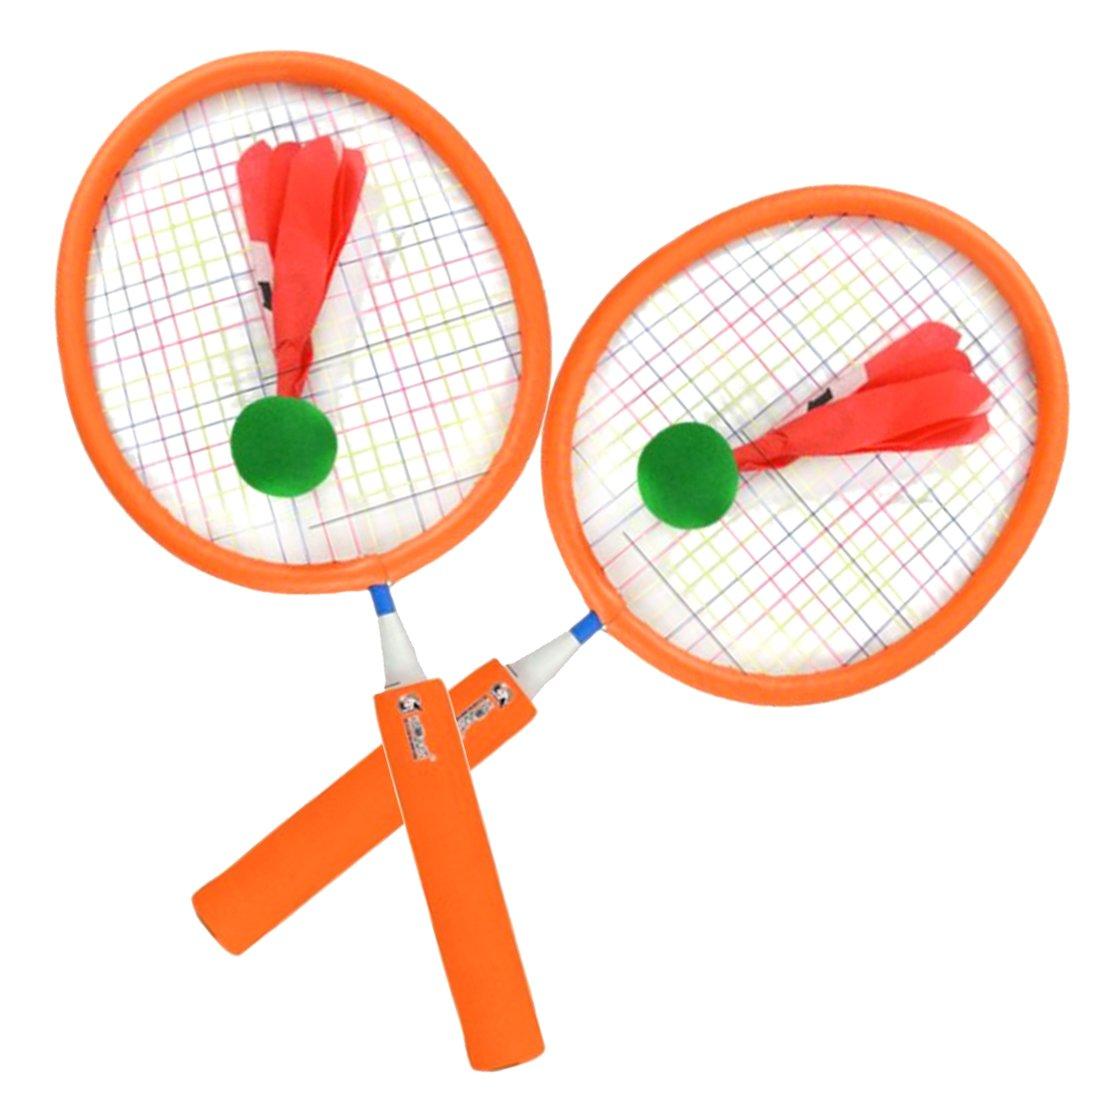 ruiyif Badminton Set for Kids with 2 Badminton Rackets 2birdies S オレンジ O15727B4705WQG S オレンジ B07CNM752D